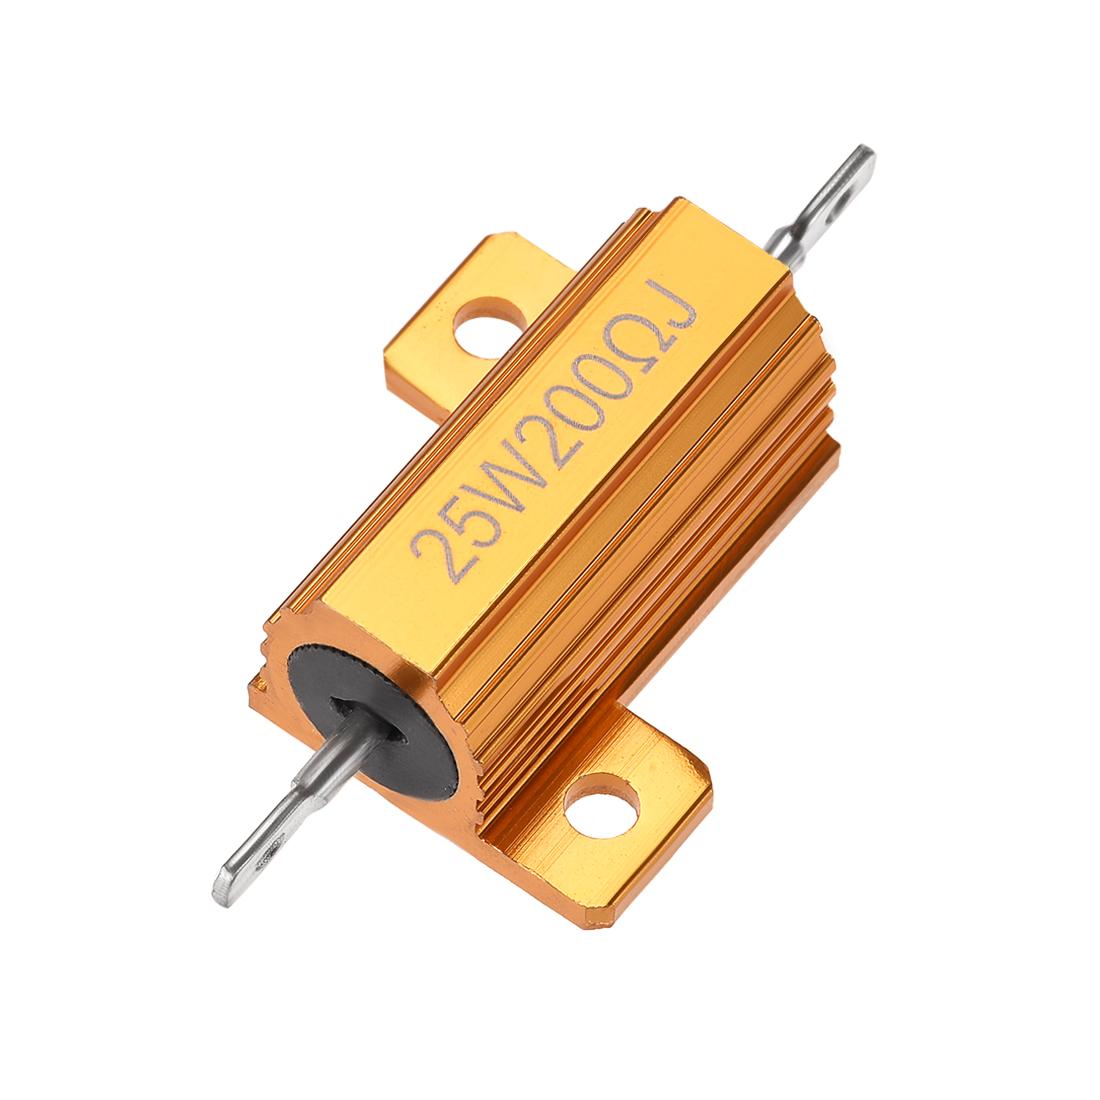 25W 200 Ohm 5% Aluminum Housing Resistor Wirewound Resistor Gold Tone 1 Pcs